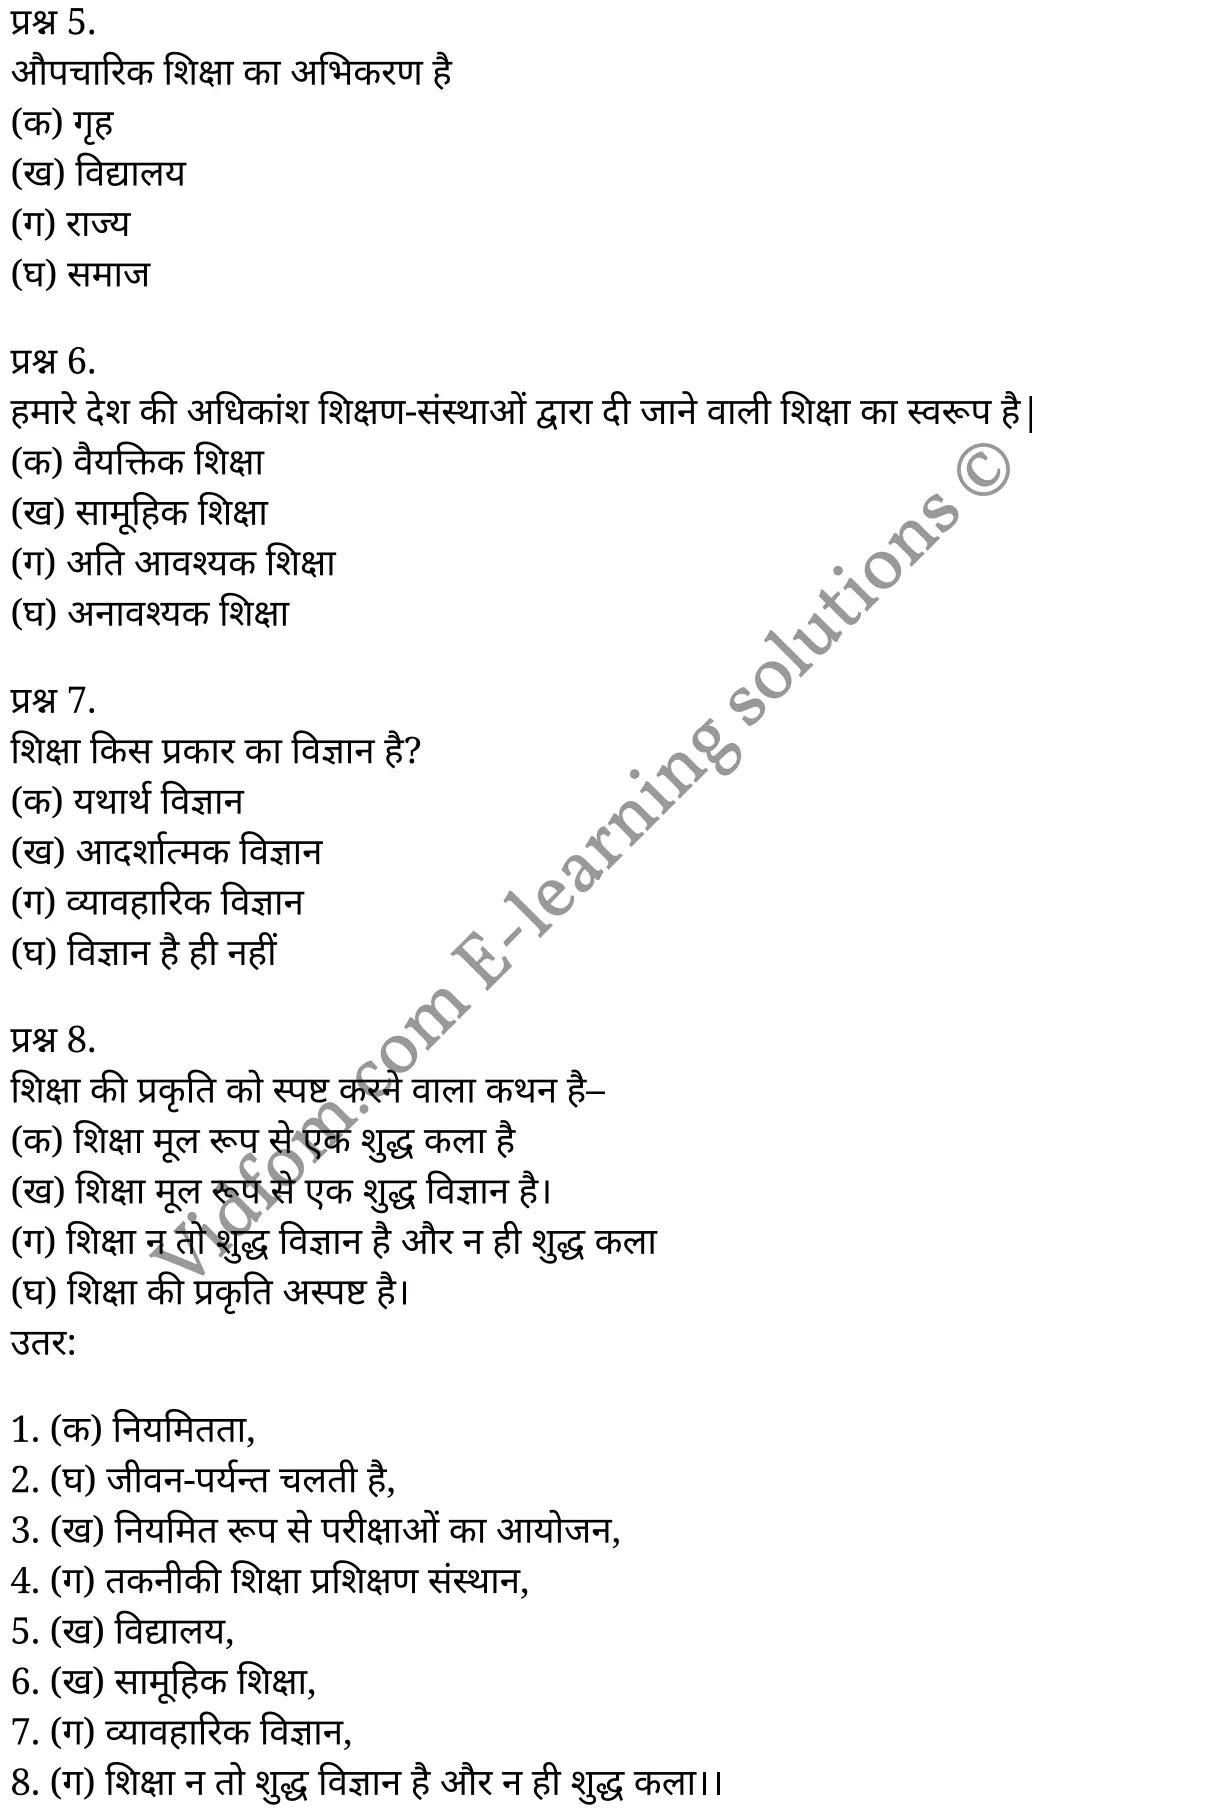 कक्षा 11 शिक्षाशास्त्र  के नोट्स  हिंदी में एनसीईआरटी समाधान,     class 11 Pedagogy chapter 2,   class 11 Pedagogy chapter 2 ncert solutions in Pedagogy,  class 11 Pedagogy chapter 2 notes in hindi,   class 11 Pedagogy chapter 2 question answer,   class 11 Pedagogy chapter 2 notes,   class 11 Pedagogy chapter 2 class 11 Pedagogy  chapter 2 in  hindi,    class 11 Pedagogy chapter 2 important questions in  hindi,   class 11 Pedagogy hindi  chapter 2 notes in hindi,   class 11 Pedagogy  chapter 2 test,   class 11 Pedagogy  chapter 2 class 11 Pedagogy  chapter 2 pdf,   class 11 Pedagogy  chapter 2 notes pdf,   class 11 Pedagogy  chapter 2 exercise solutions,  class 11 Pedagogy  chapter 2,  class 11 Pedagogy  chapter 2 notes study rankers,  class 11 Pedagogy  chapter 2 notes,   class 11 Pedagogy hindi  chapter 2 notes,    class 11 Pedagogy   chapter 2  class 11  notes pdf,  class 11 Pedagogy  chapter 2 class 11  notes  ncert,  class 11 Pedagogy  chapter 2 class 11 pdf,   class 11 Pedagogy  chapter 2  book,   class 11 Pedagogy  chapter 2 quiz class 11  ,    11  th class 11 Pedagogy chapter 2  book up board,   up board 11  th class 11 Pedagogy chapter 2 notes,  class 11 Pedagogy,   class 11 Pedagogy ncert solutions in Pedagogy,   class 11 Pedagogy notes in hindi,   class 11 Pedagogy question answer,   class 11 Pedagogy notes,  class 11 Pedagogy class 11 Pedagogy  chapter 2 in  hindi,    class 11 Pedagogy important questions in  hindi,   class 11 Pedagogy notes in hindi,    class 11 Pedagogy test,  class 11 Pedagogy class 11 Pedagogy  chapter 2 pdf,   class 11 Pedagogy notes pdf,   class 11 Pedagogy exercise solutions,   class 11 Pedagogy,  class 11 Pedagogy notes study rankers,   class 11 Pedagogy notes,  class 11 Pedagogy notes,   class 11 Pedagogy  class 11  notes pdf,   class 11 Pedagogy class 11  notes  ncert,   class 11 Pedagogy class 11 pdf,   class 11 Pedagogy  book,  class 11 Pedagogy quiz class 11  ,  11  th class 11 Pedagogy    book up board,    up board 11  th c